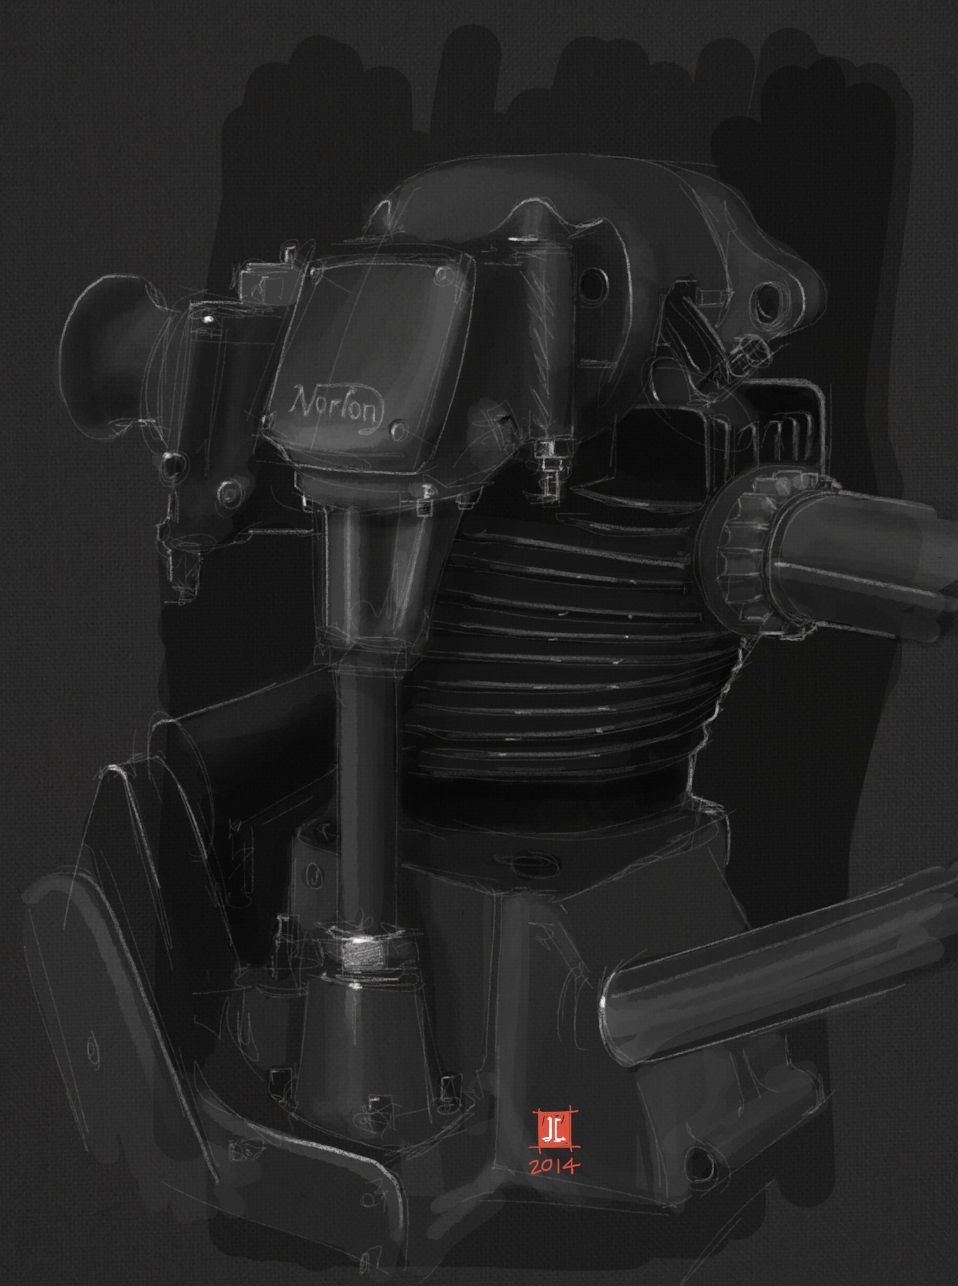 Norton Motor